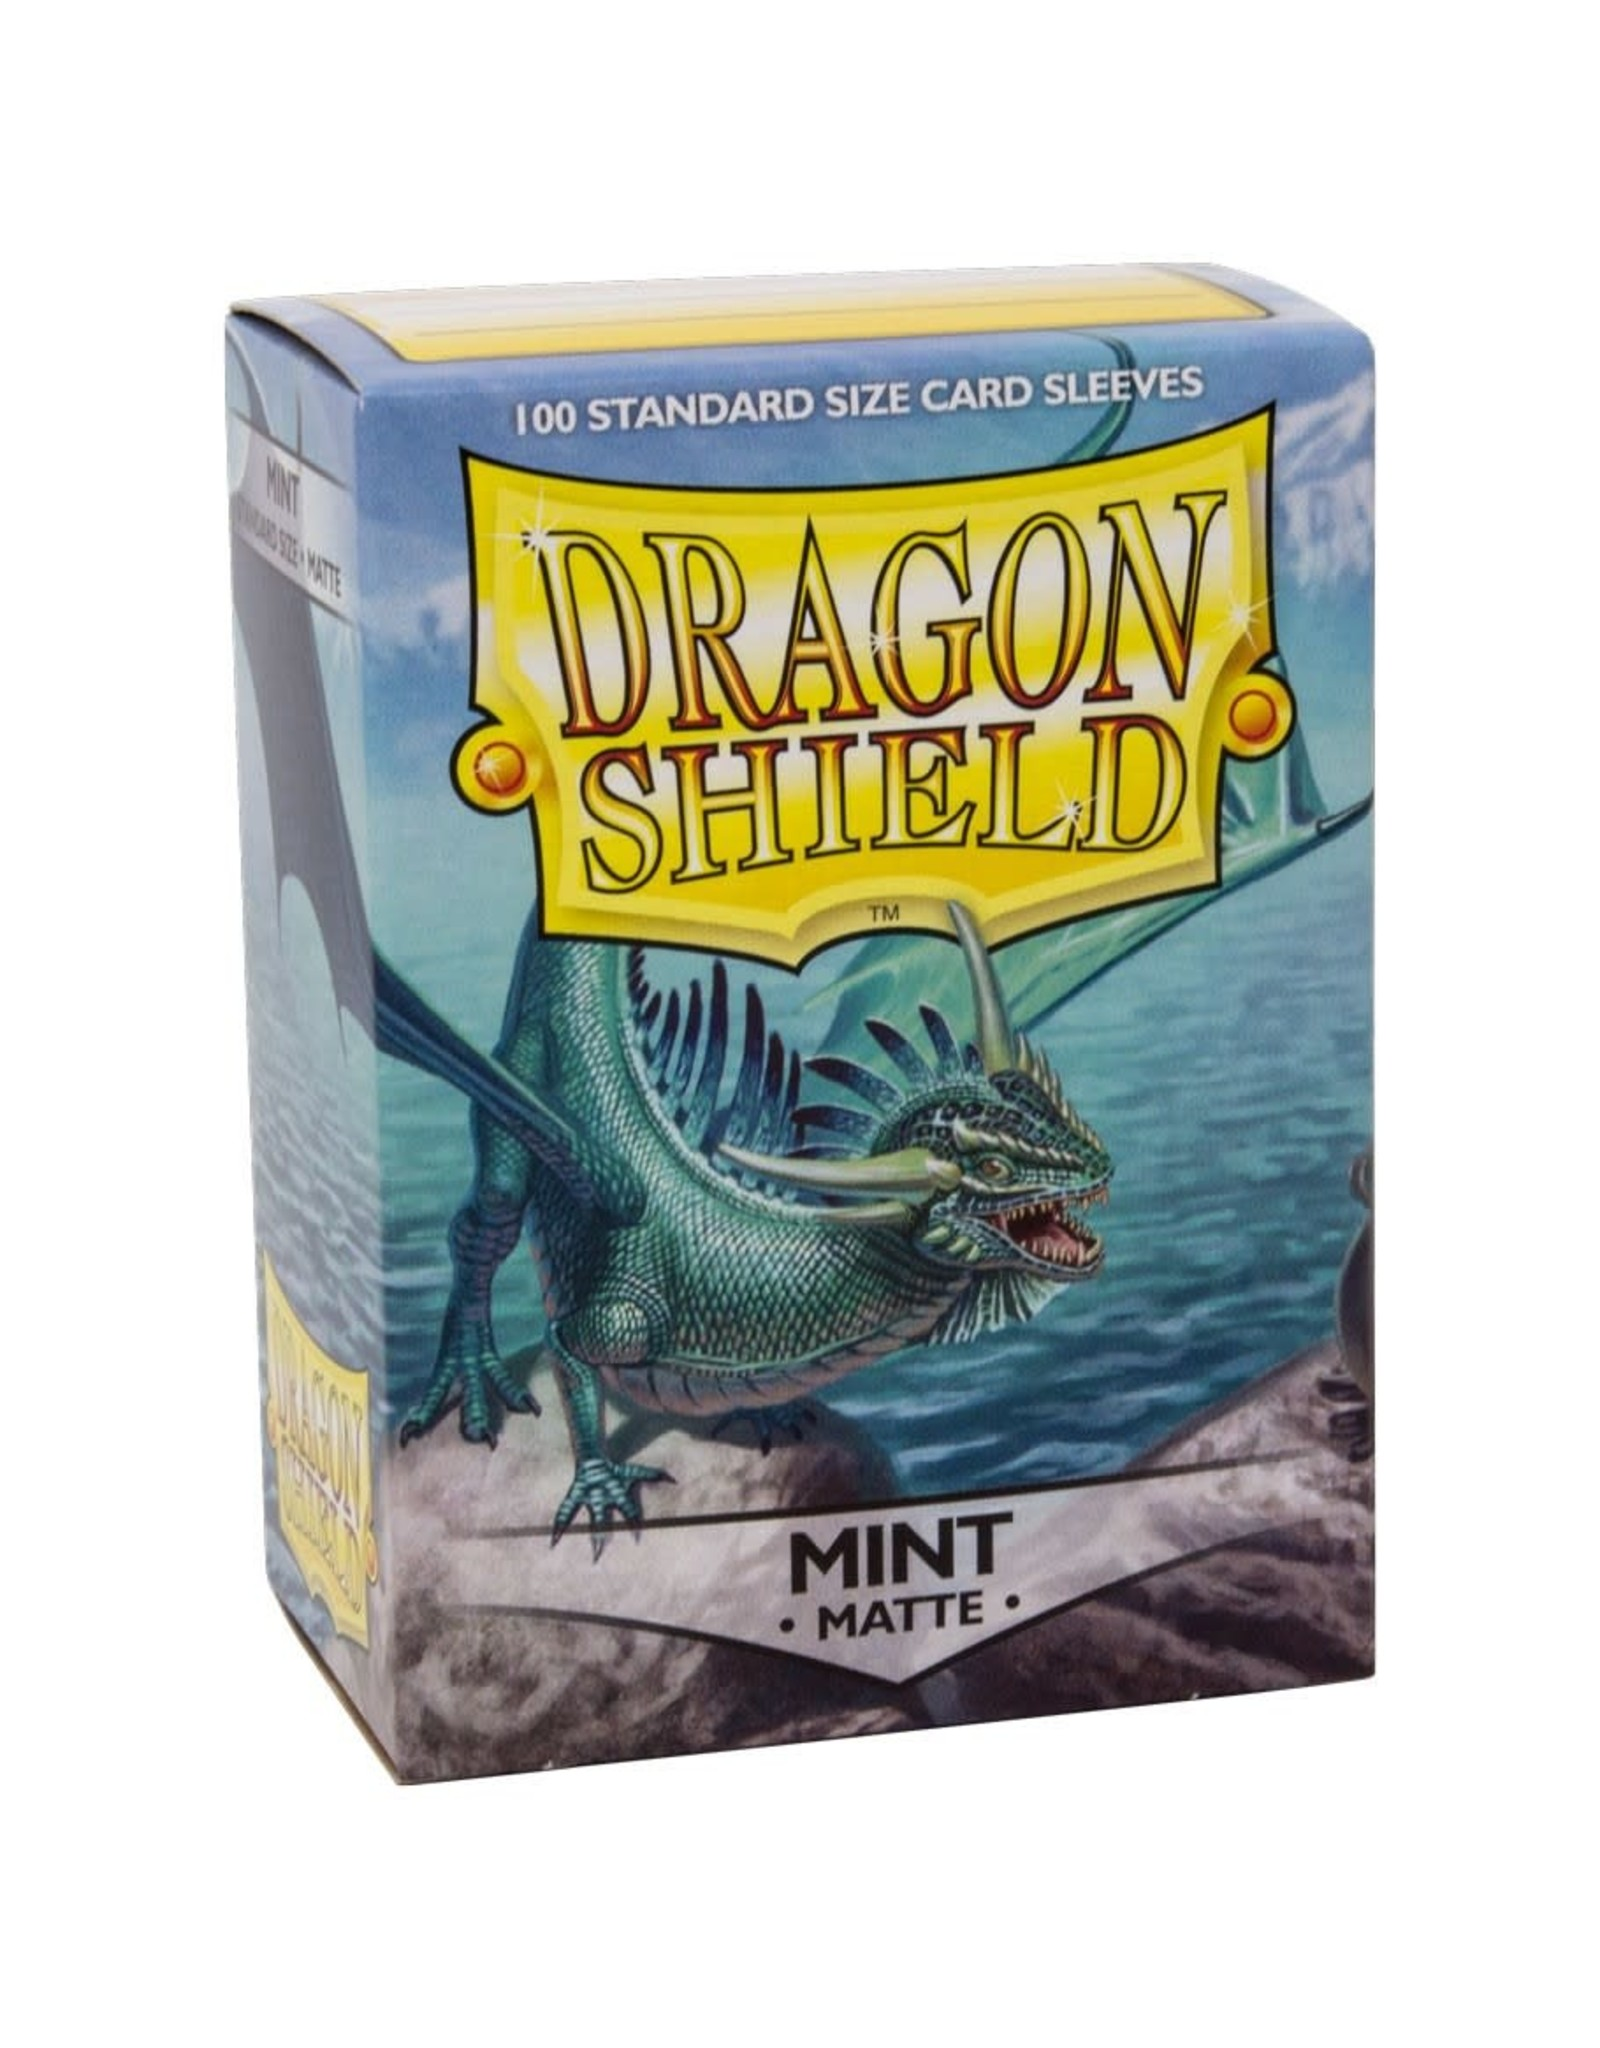 Dragon Shield Dragon Shield Matte Mint Card Sleeves (100)